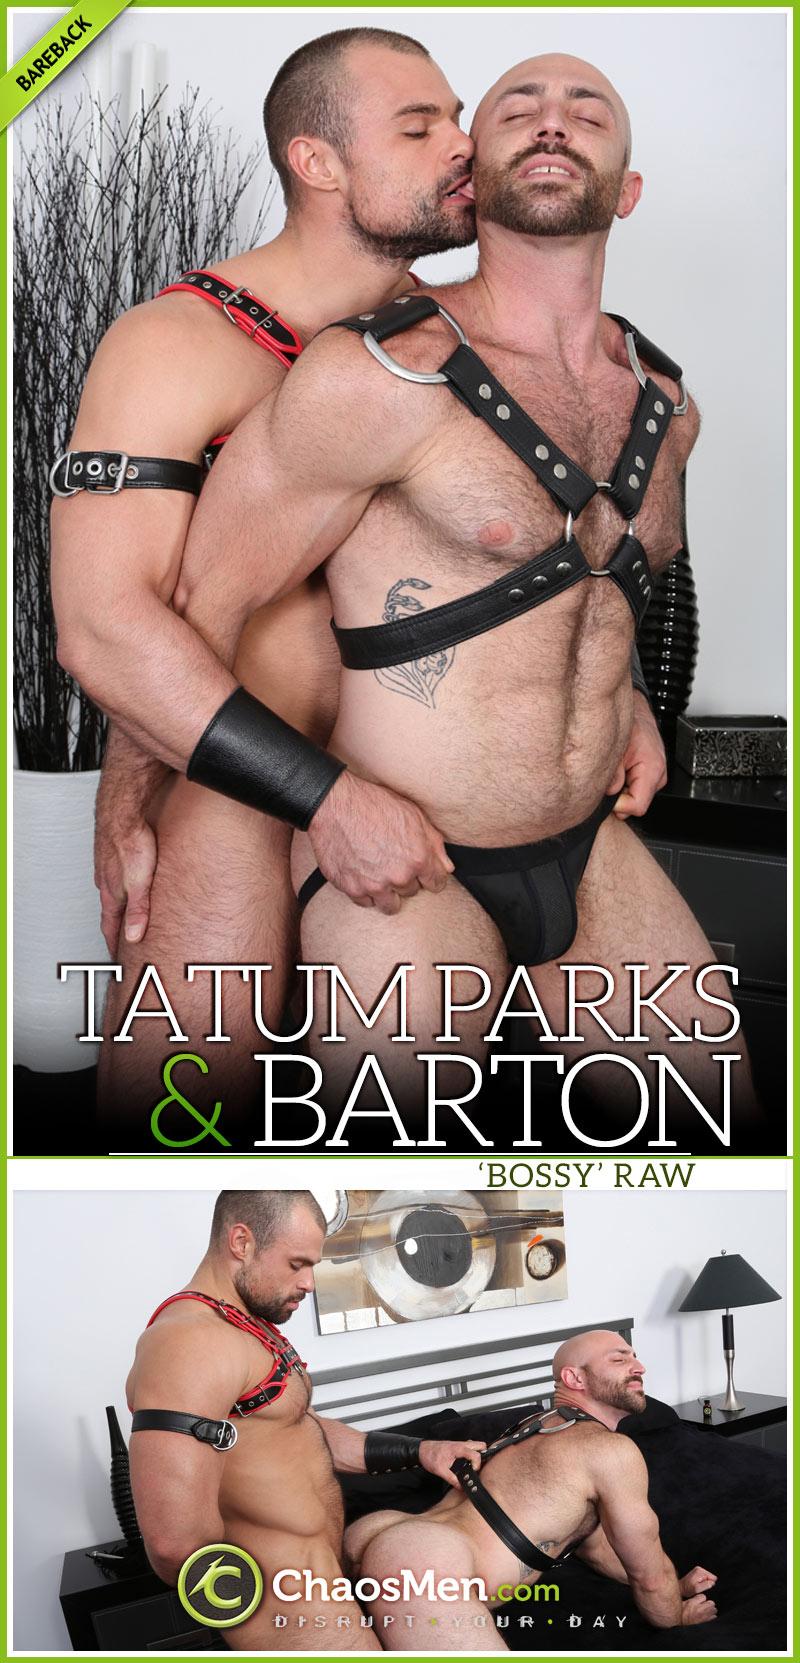 Tatum Parks & Barton Bossy RAW at ChaosMen